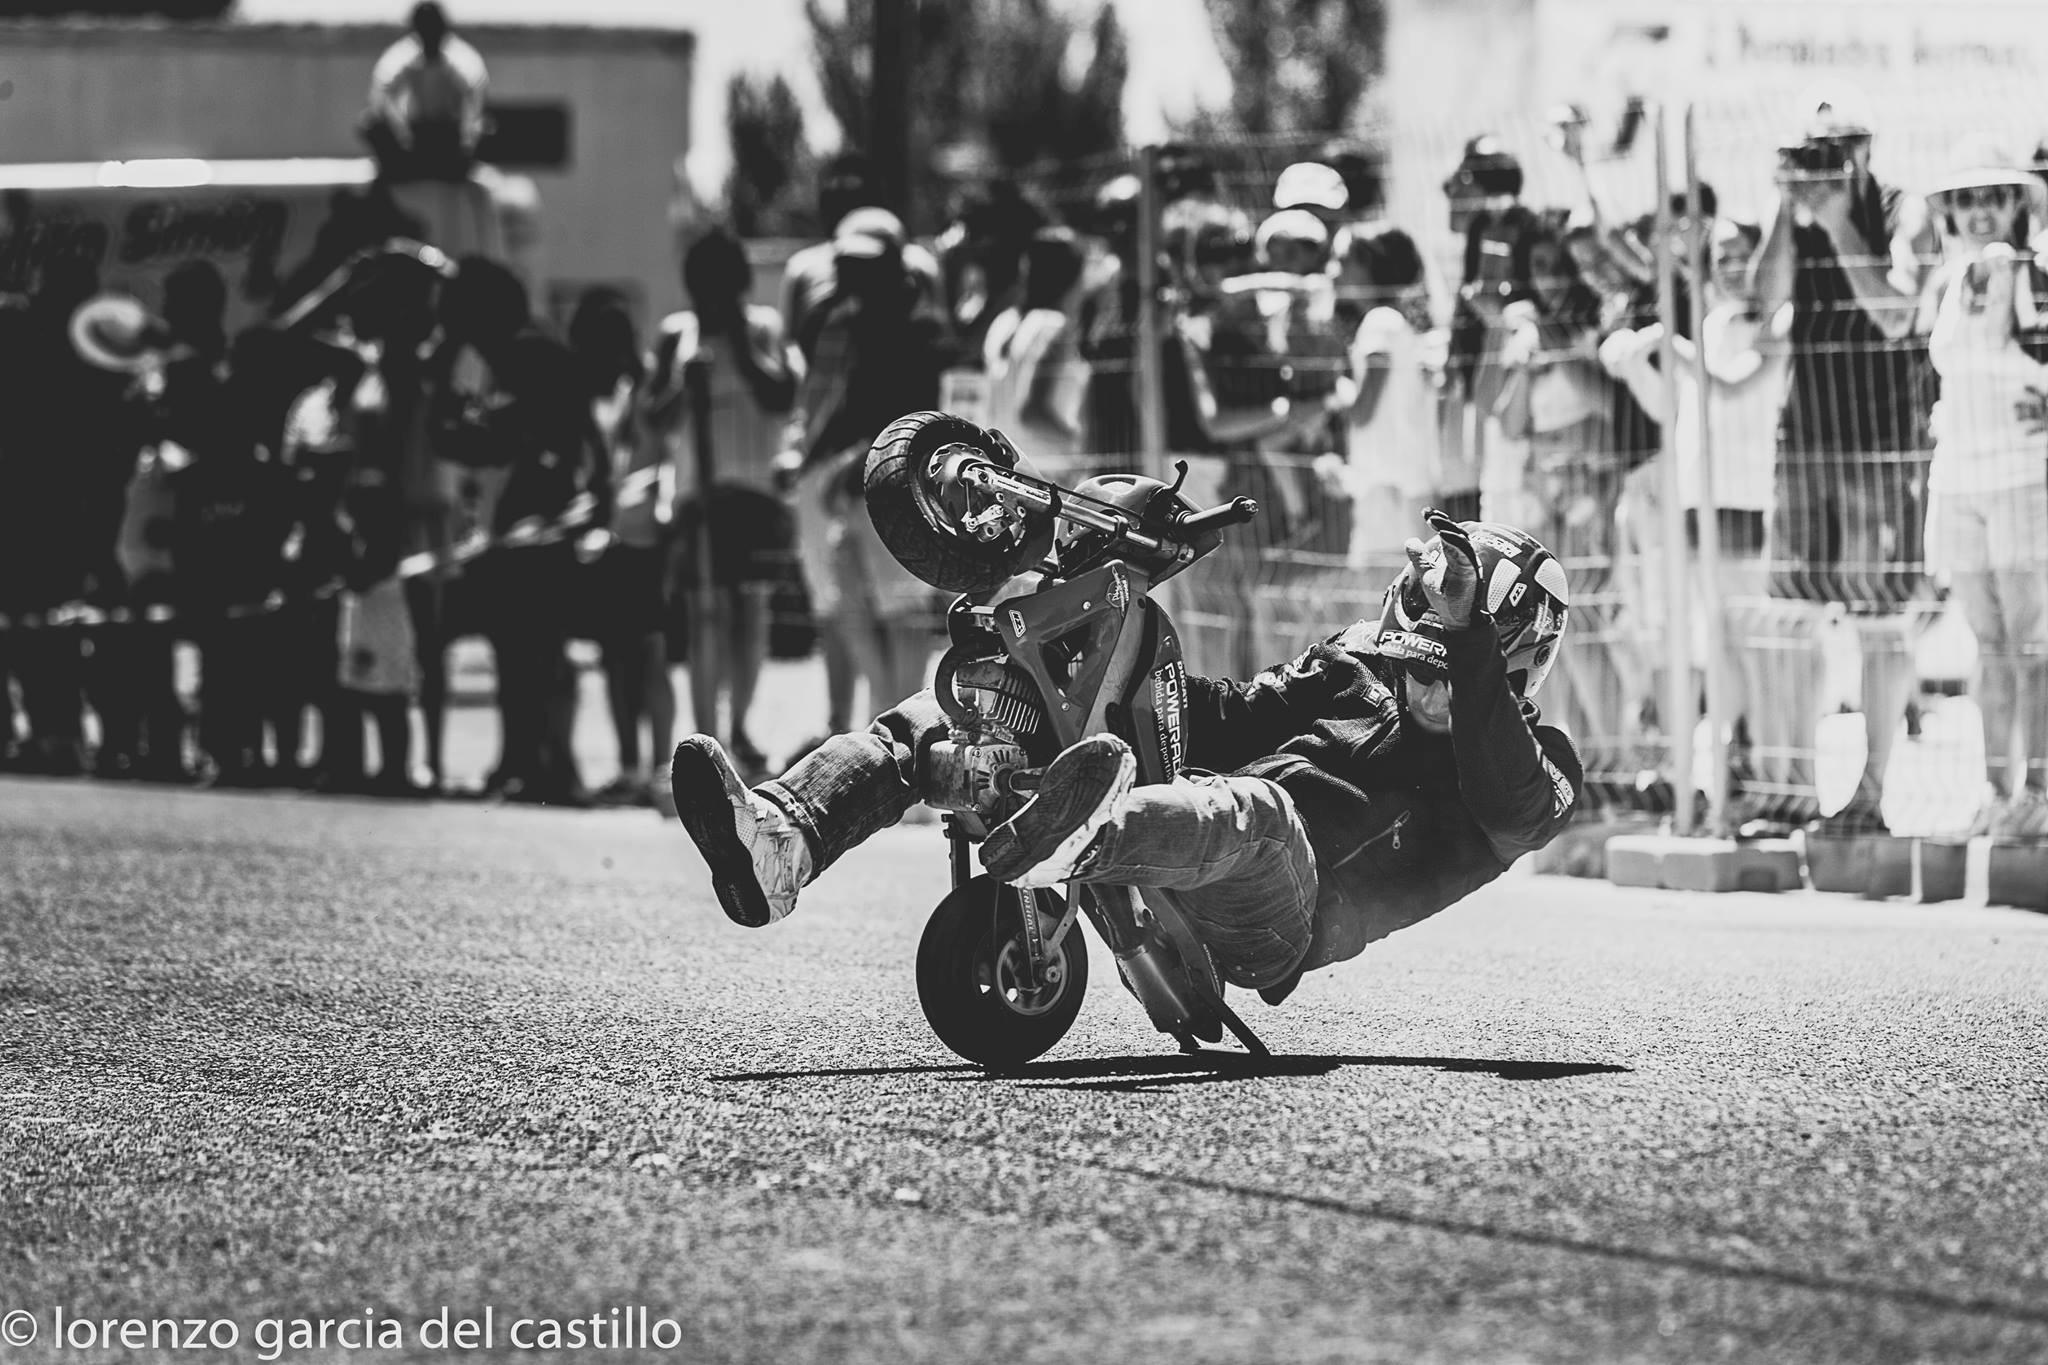 6-sixty-rider-festival_2016_julian_simon_club_emilio_zamora_ducati_stunt_team_motor_show_freestyle_moto_espectaculo_exhibicion_minibike_pocketbike_polini_wheelie_mini_moto